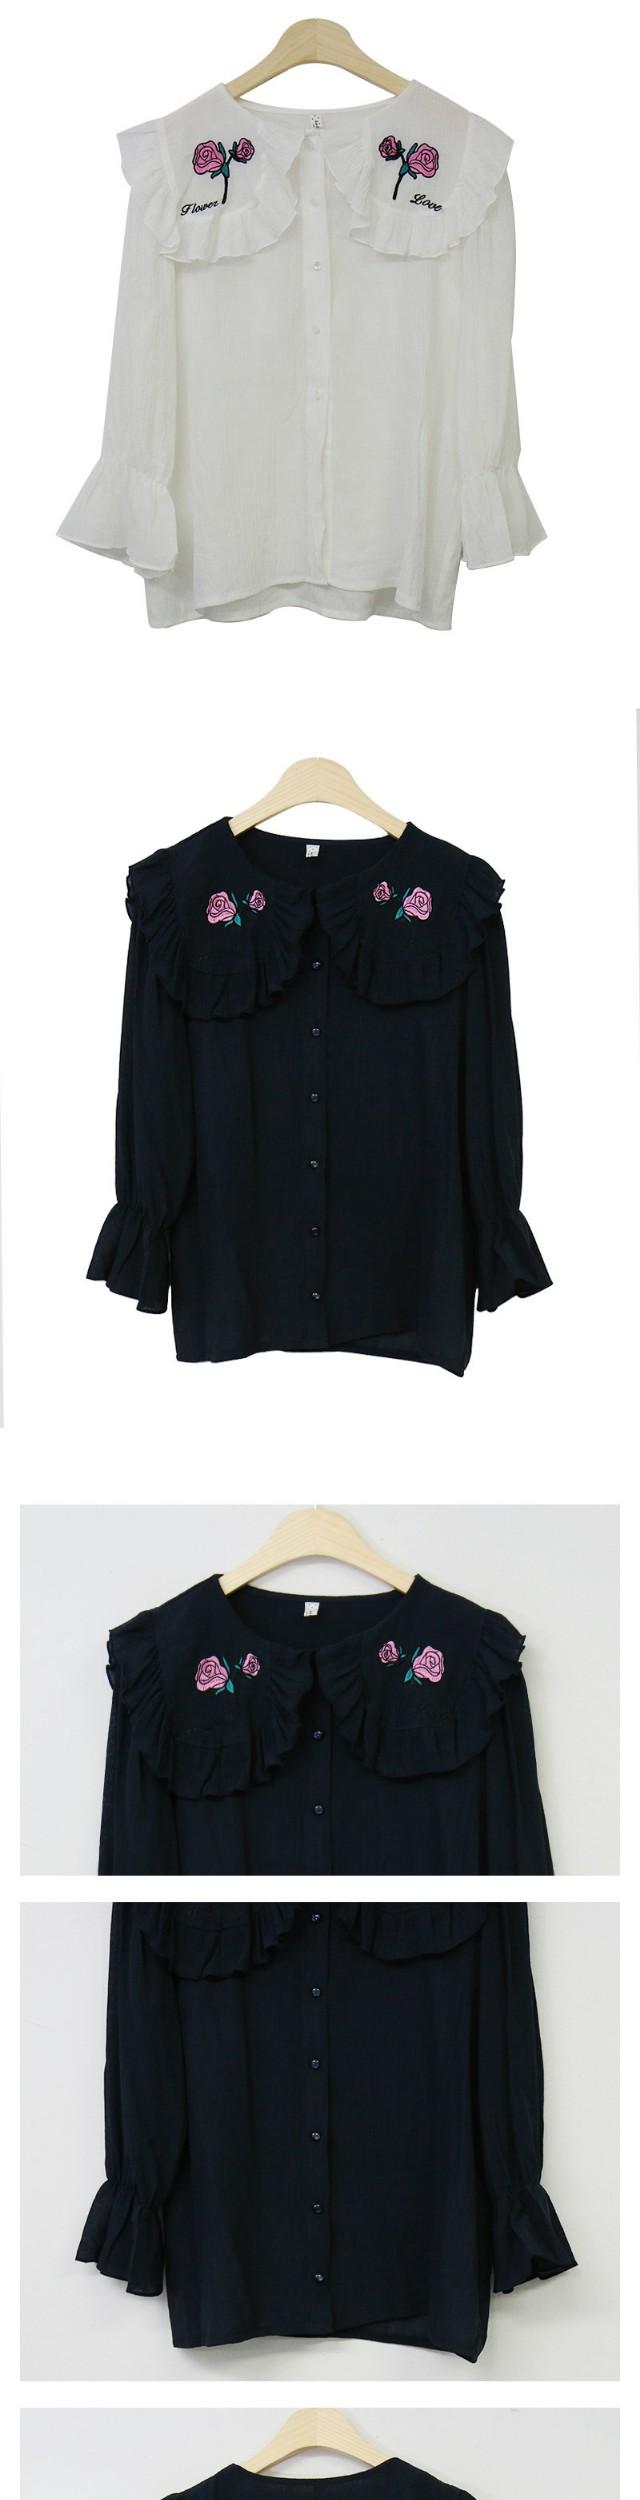 Rosesera blouse